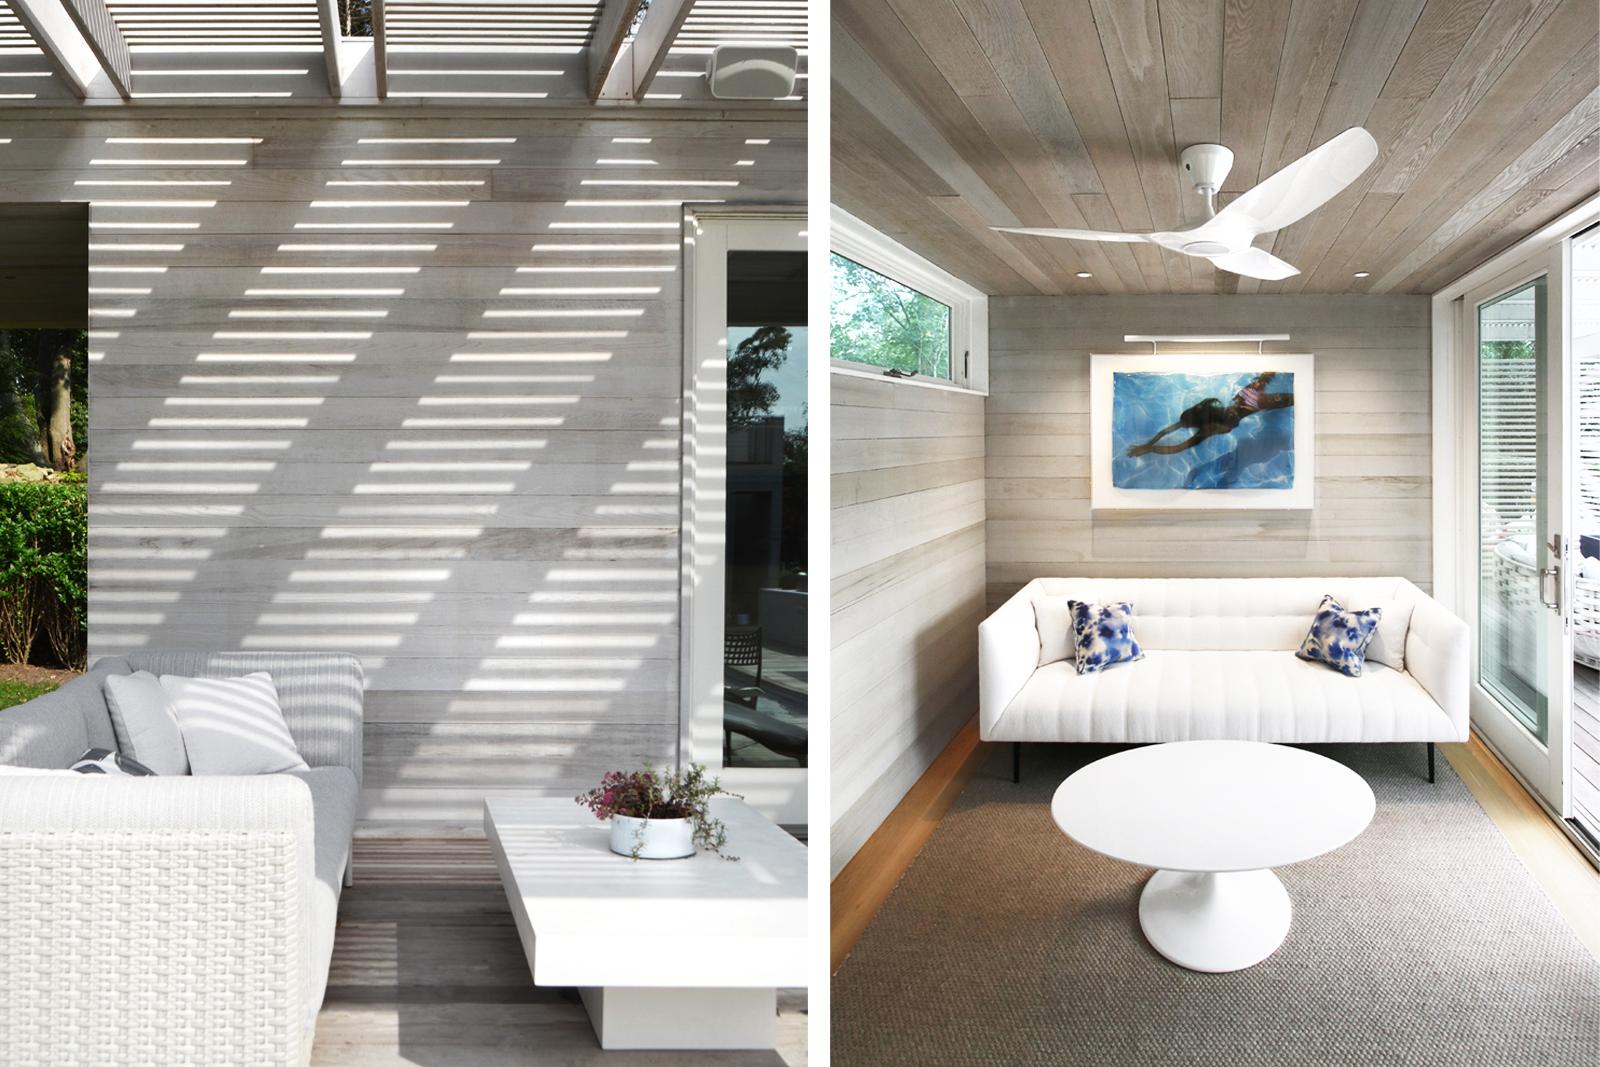 27-re4a-resolution-4-architecture-modern-modular-prefab-bridgehampton house-exterior-pool-house.jpg